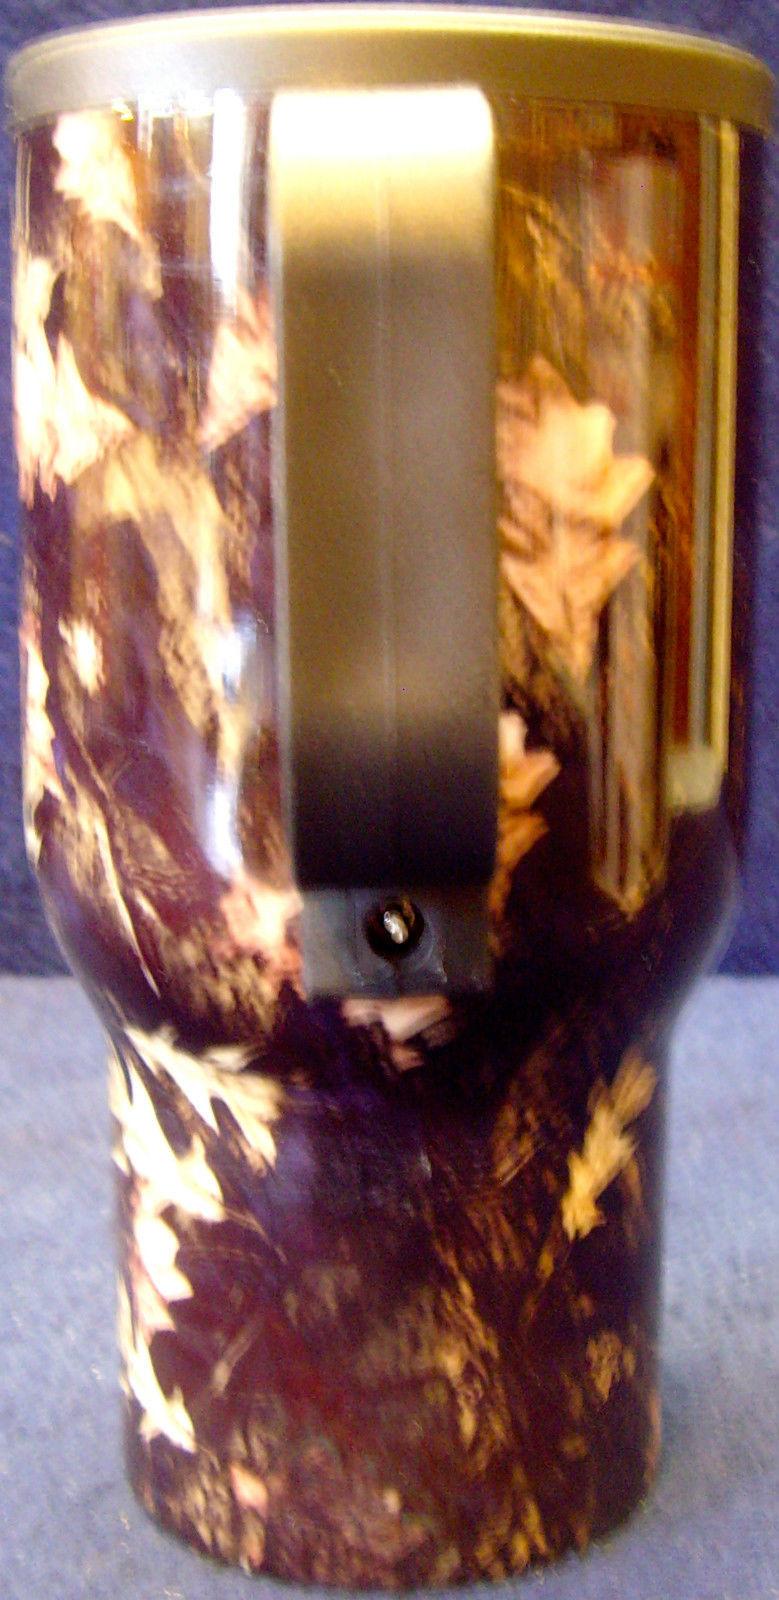 NEW•5 Minute Fix-It•Camouflage•13 oz•Heated Car Mug•w/Original Box/Adapter/Paper